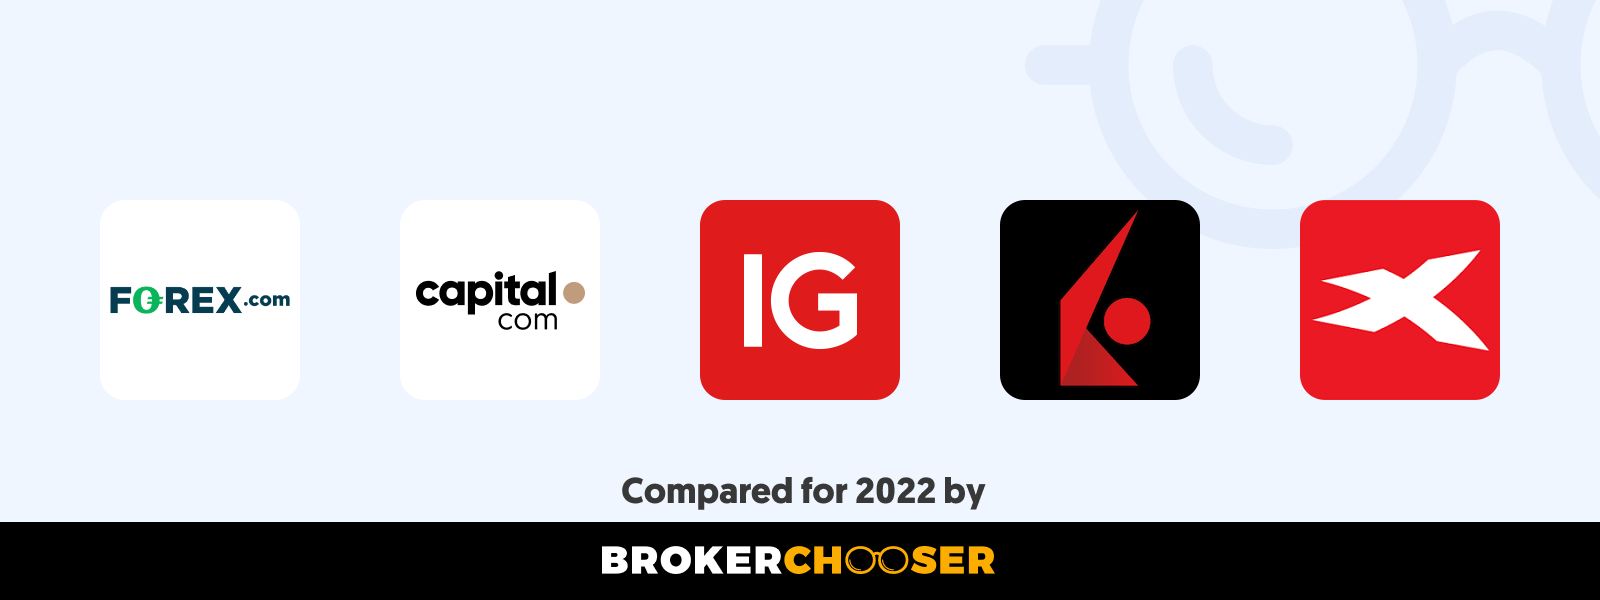 Best forex brokers for beginners in Paraguay in 2021